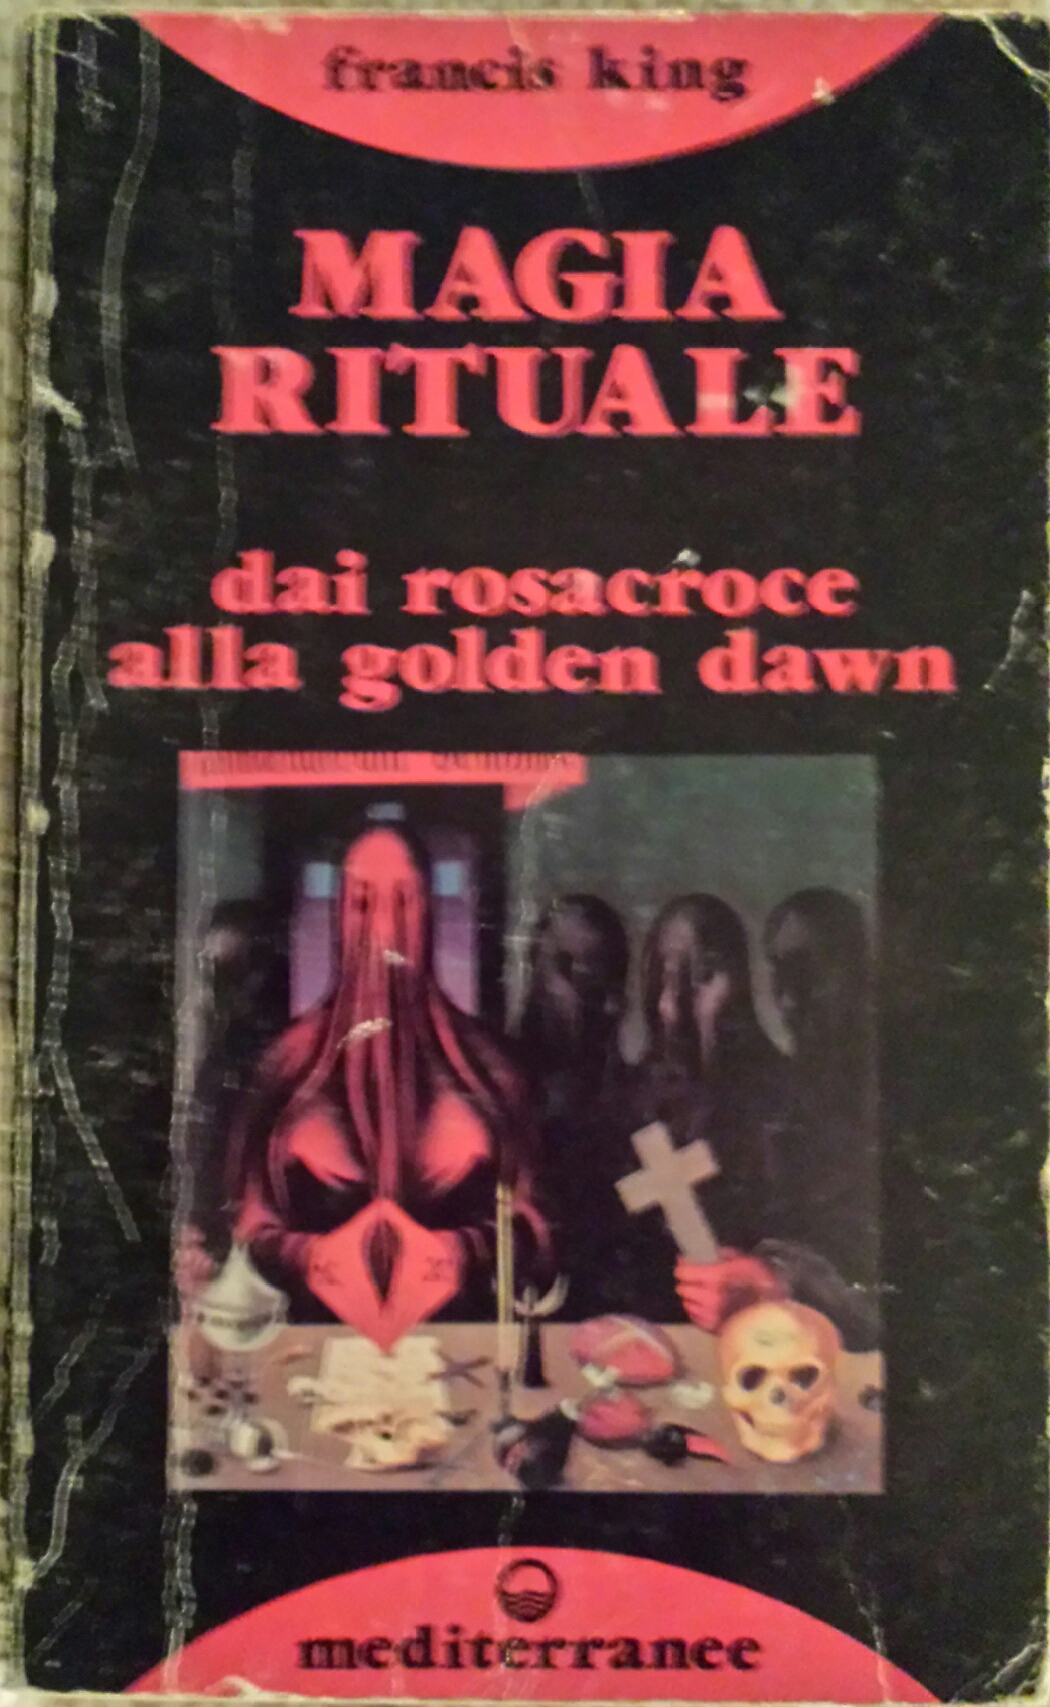 Magia rituale